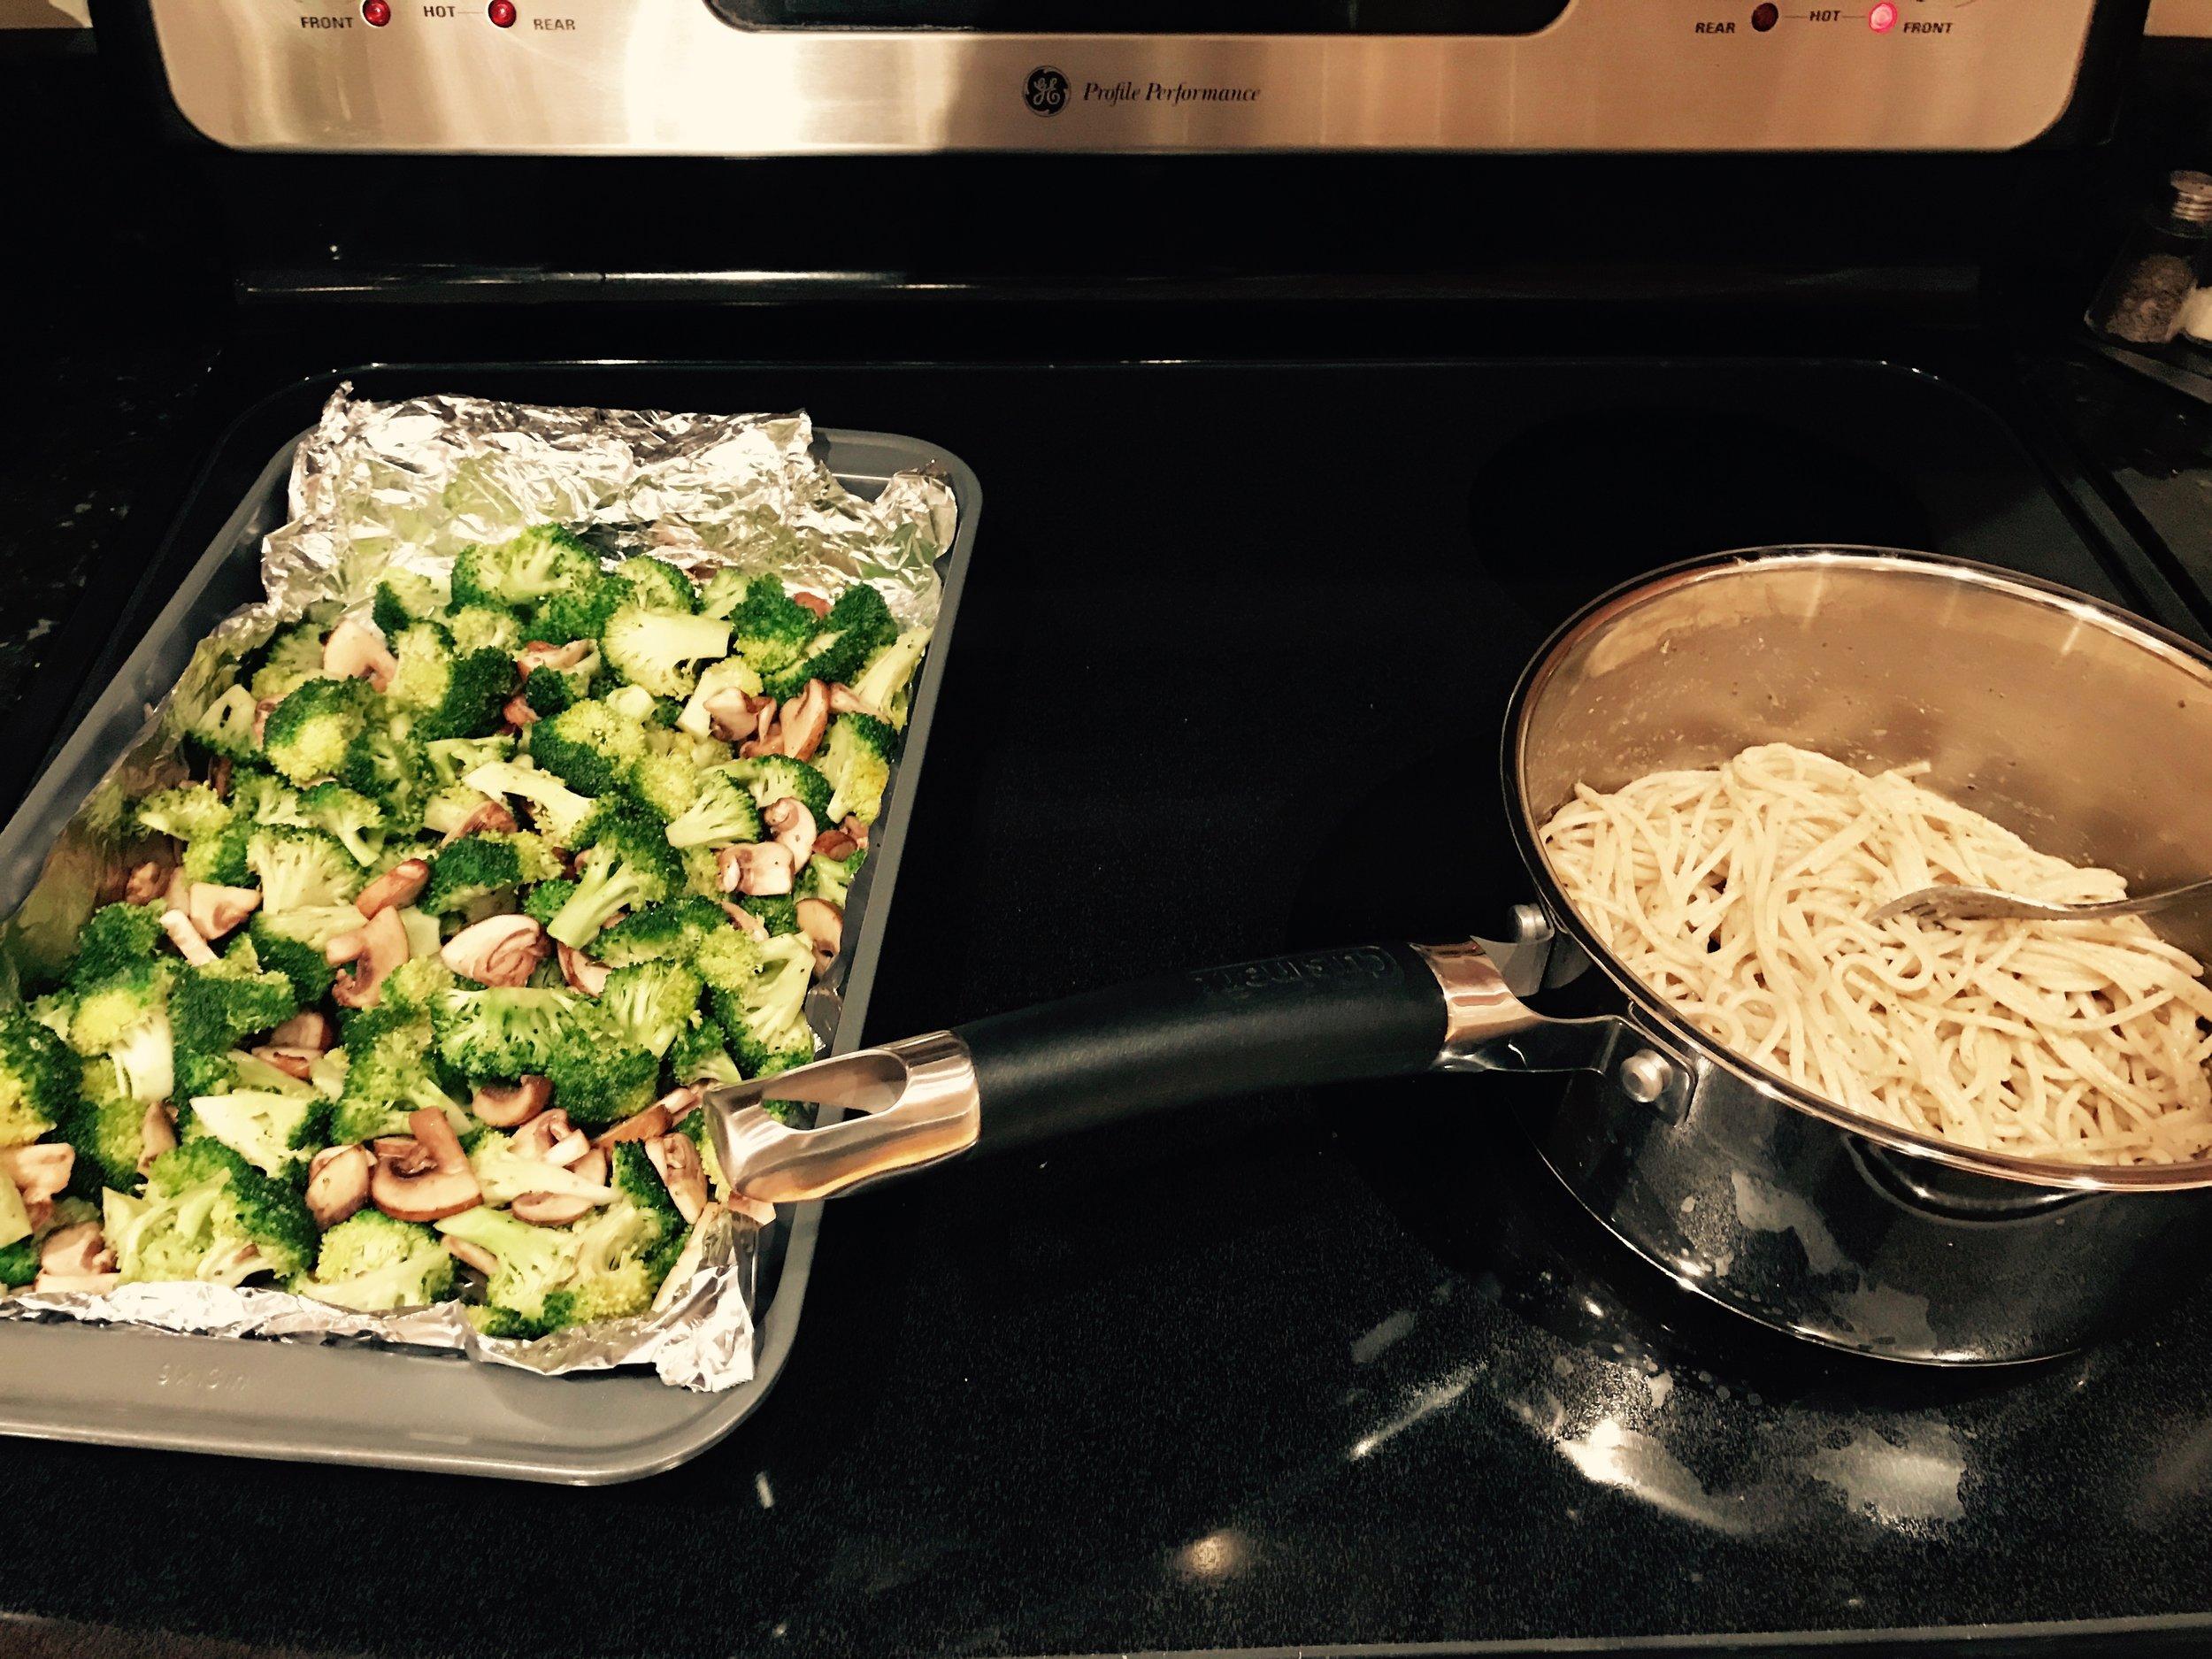 gluten free pesto pasta and vegetables